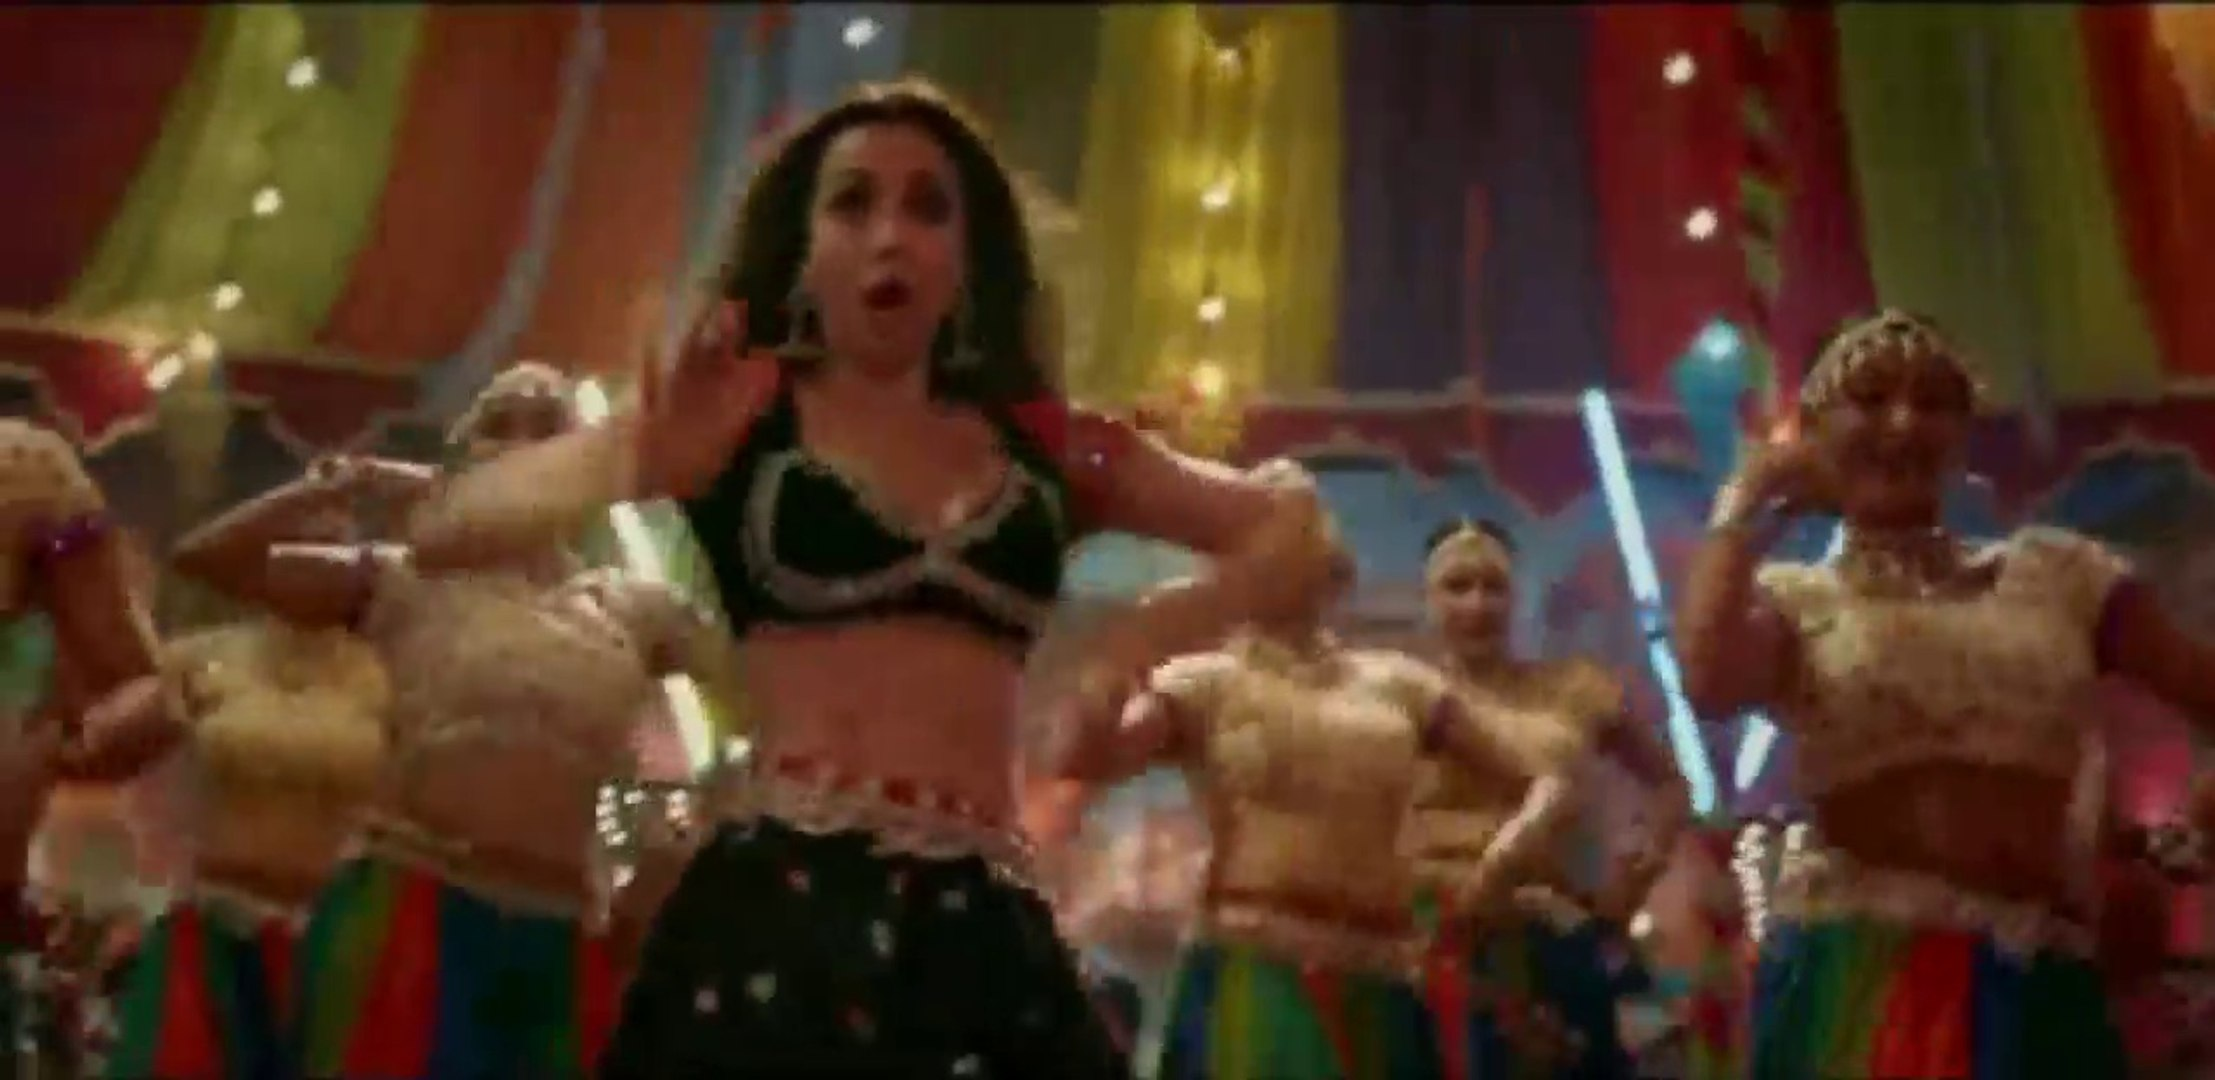 Hello Hello   HD Video Song   Pataakha   Malaika Arora   Vishal Bhardwaj   Rekha Bhardwaj   Gulzar,